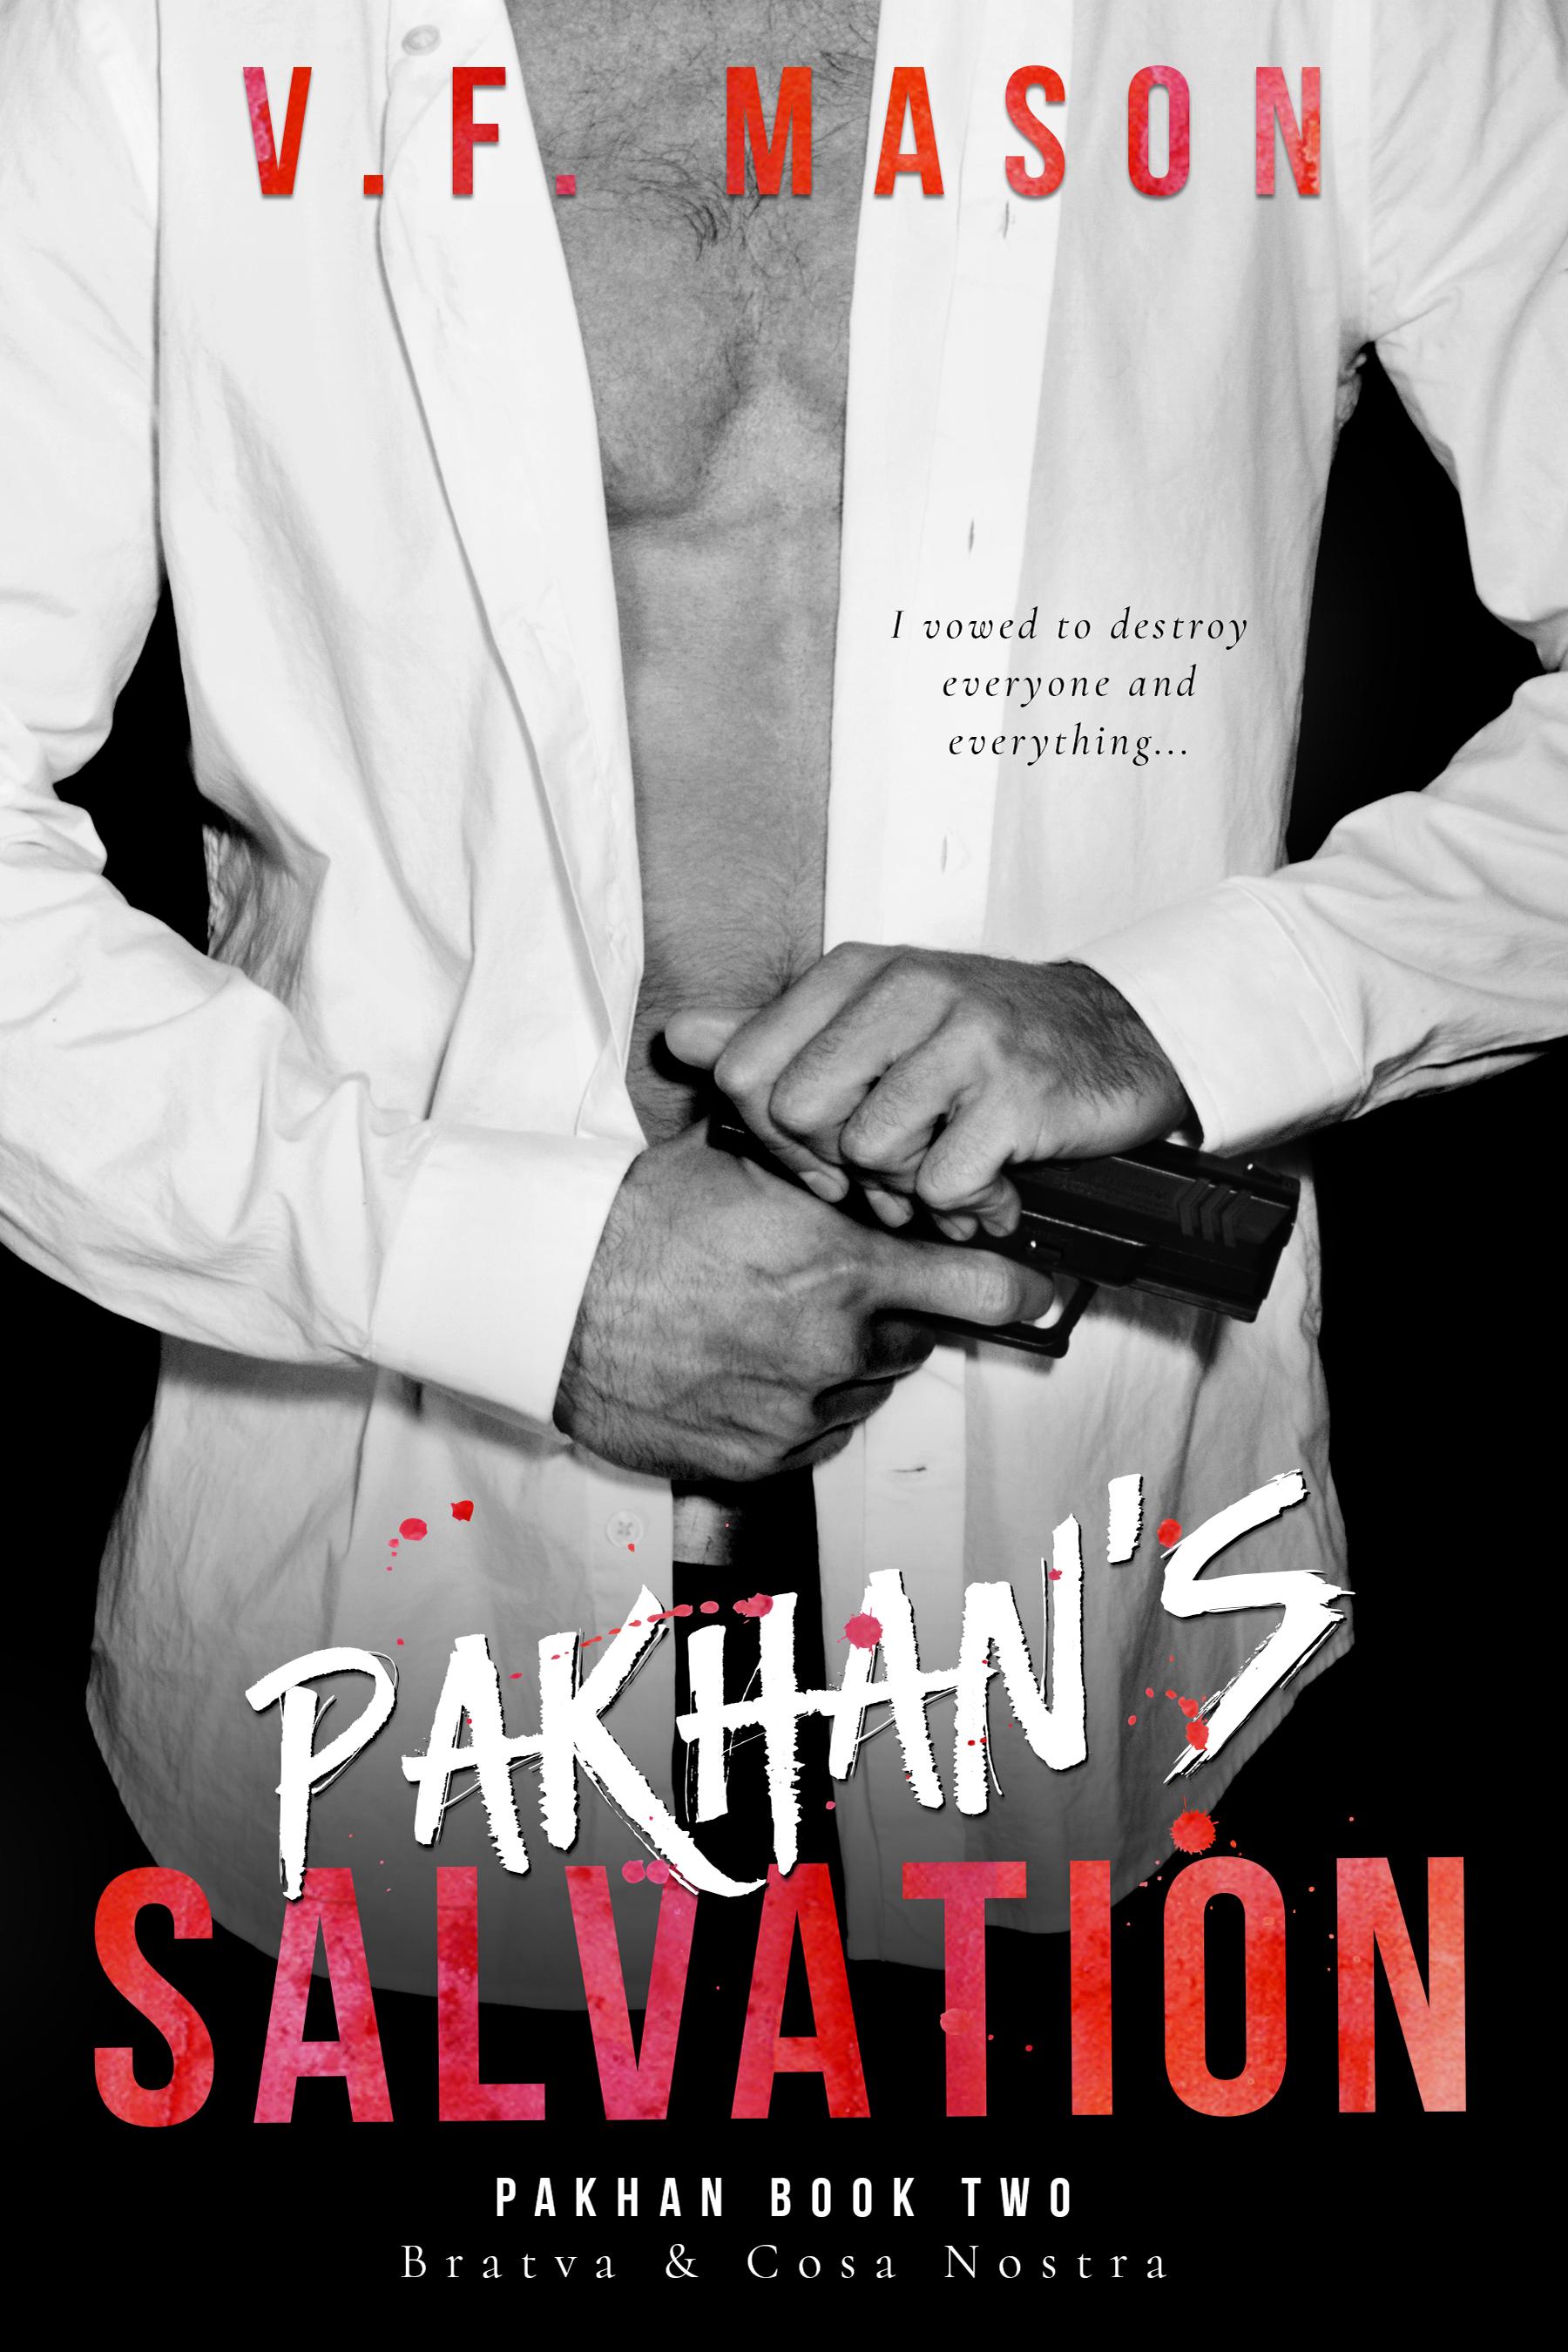 Pakhan's Salvation (Pakhan Duet #2) by V F  Mason – Am Kinda